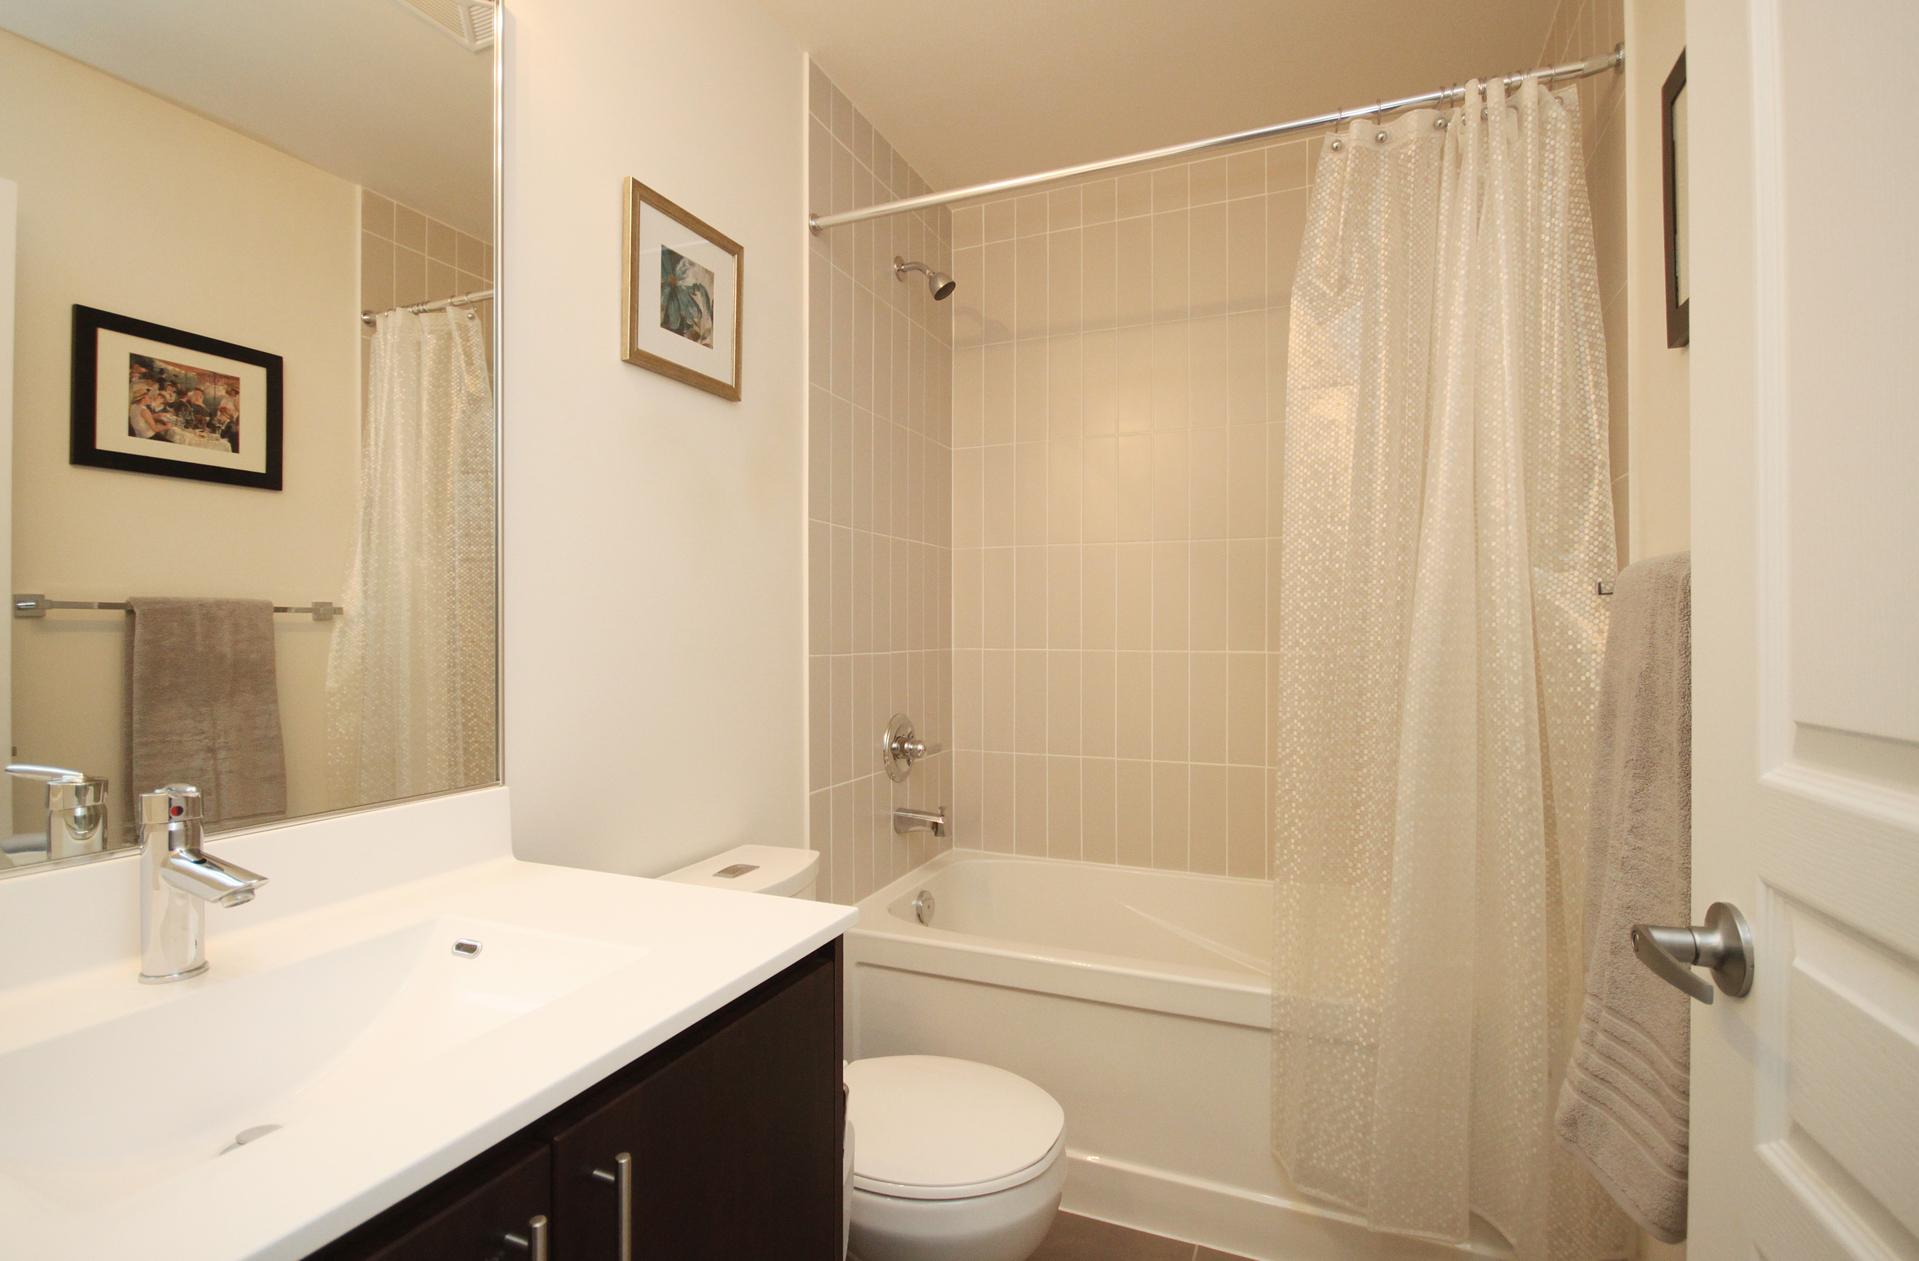 4 Piece Bathroom at 708 - 85 The Donway Donway W, Banbury-Don Mills, Toronto